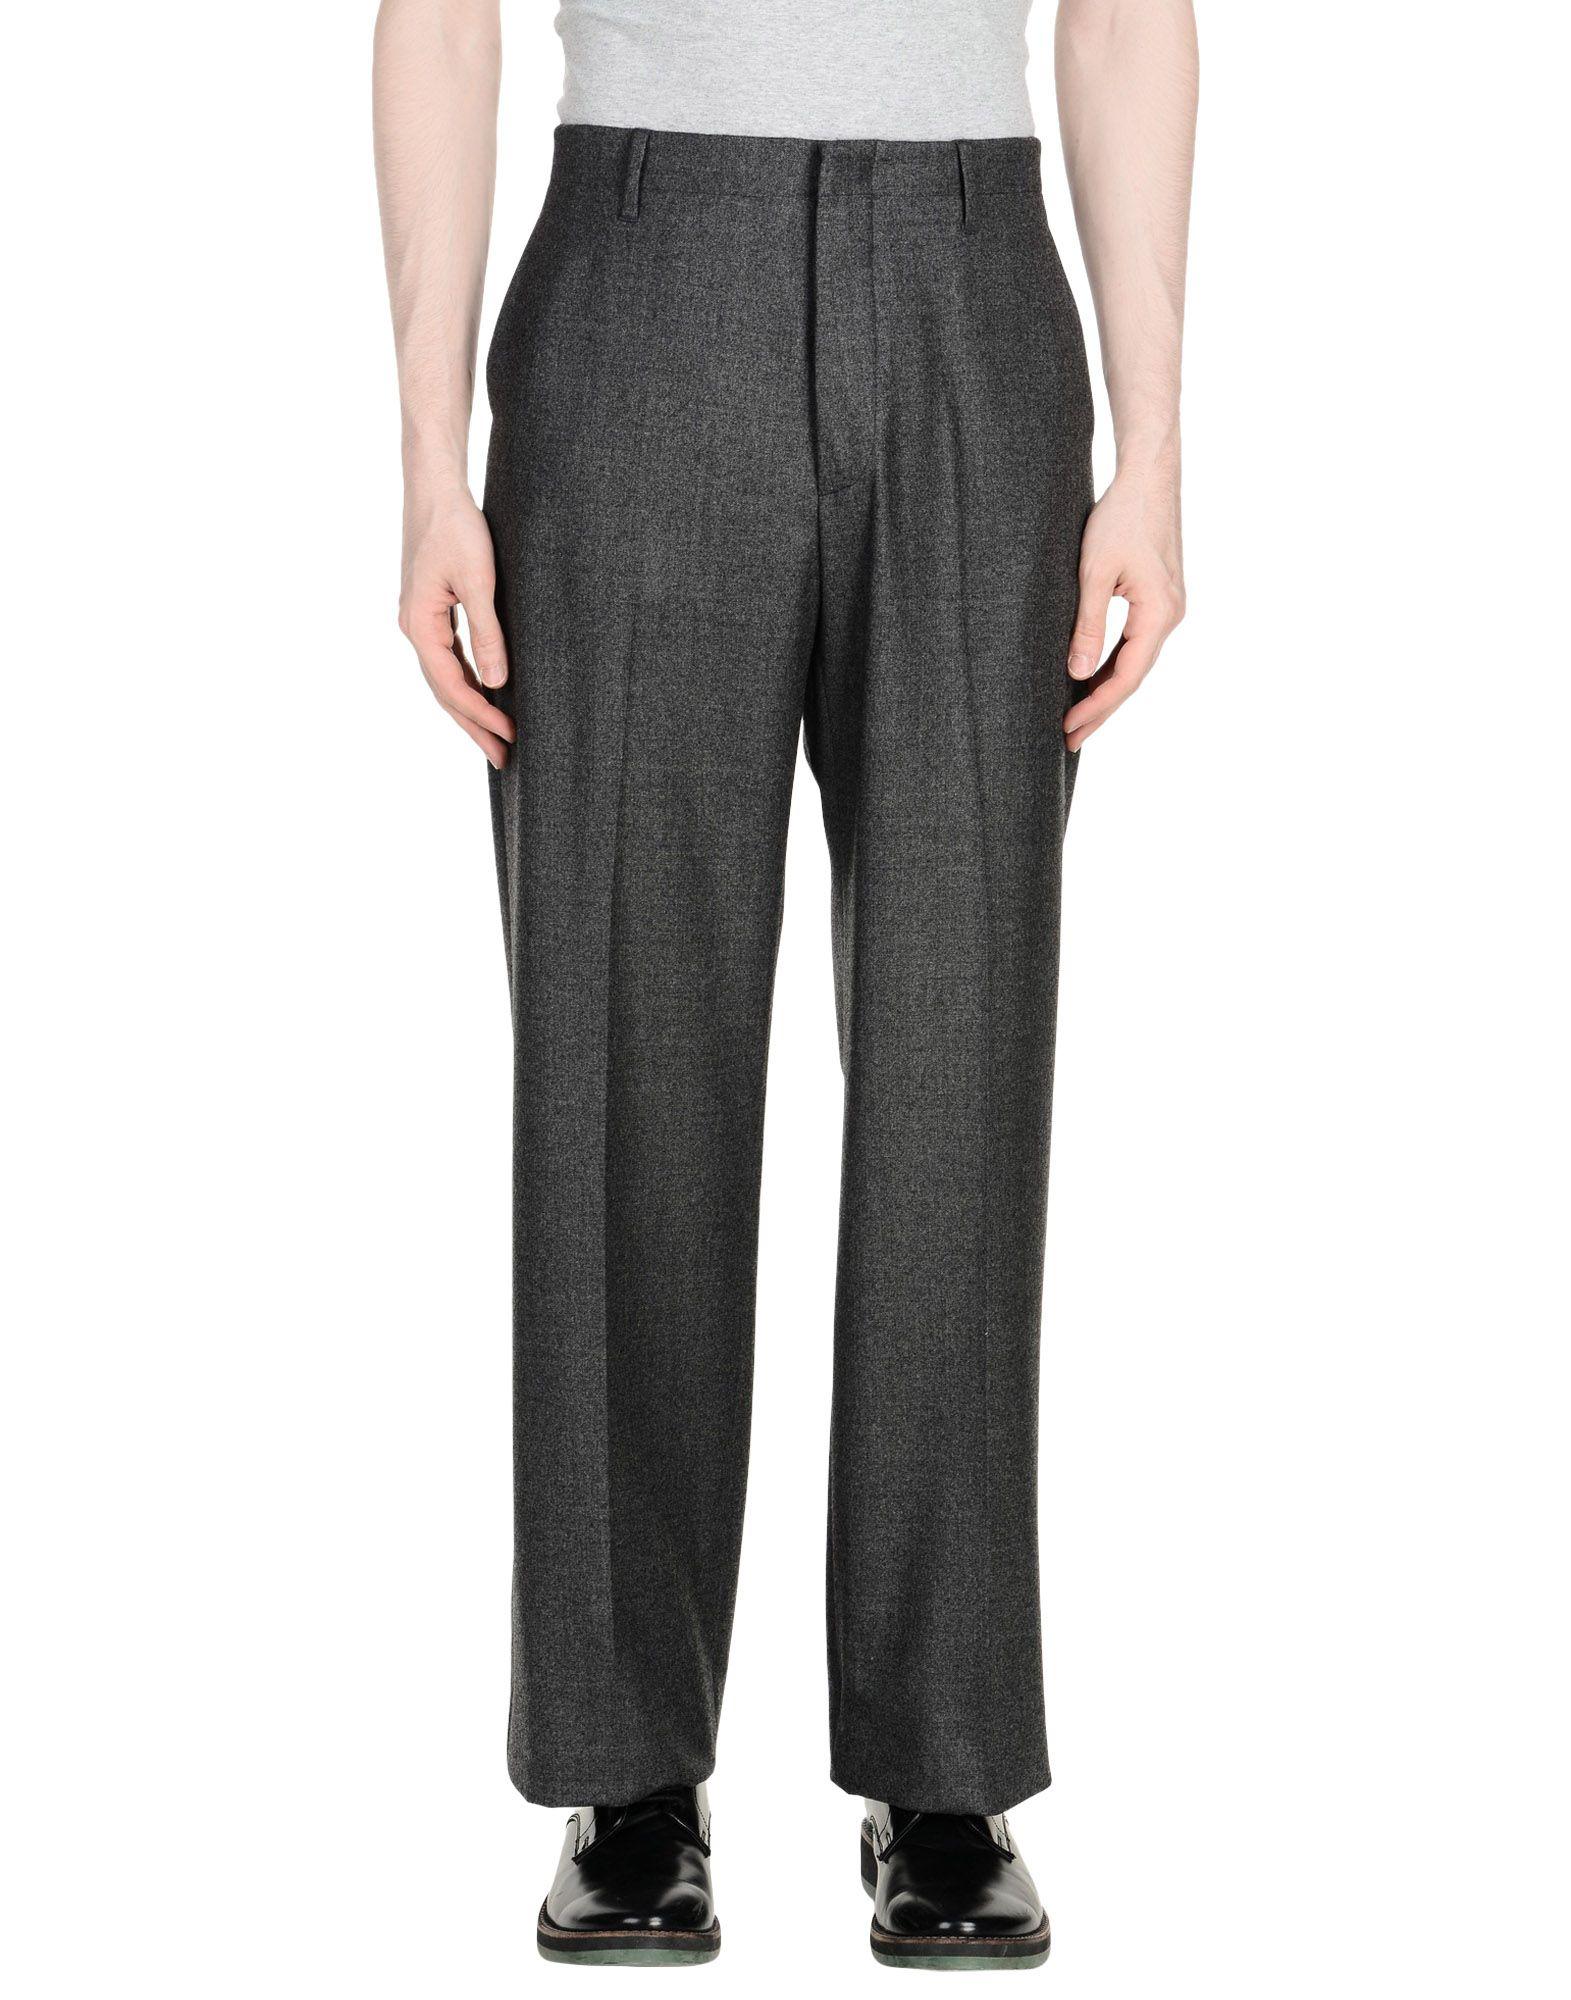 Pantalone Miu Miu Uomo - Acquista online su